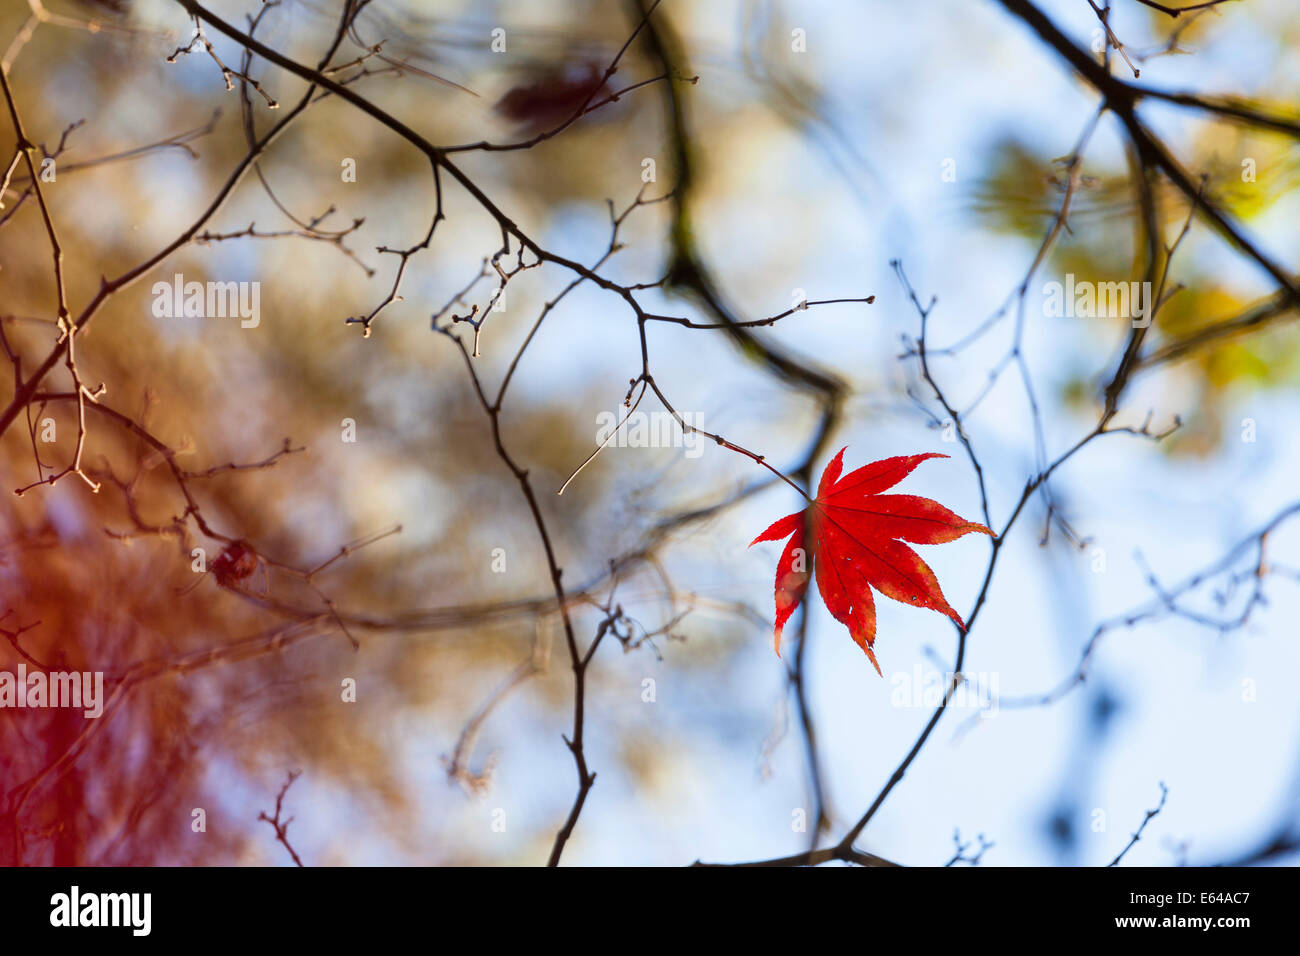 Herbstliche Bäume, Westonbirt Arboretum, Gloucestershire, UK Stockbild